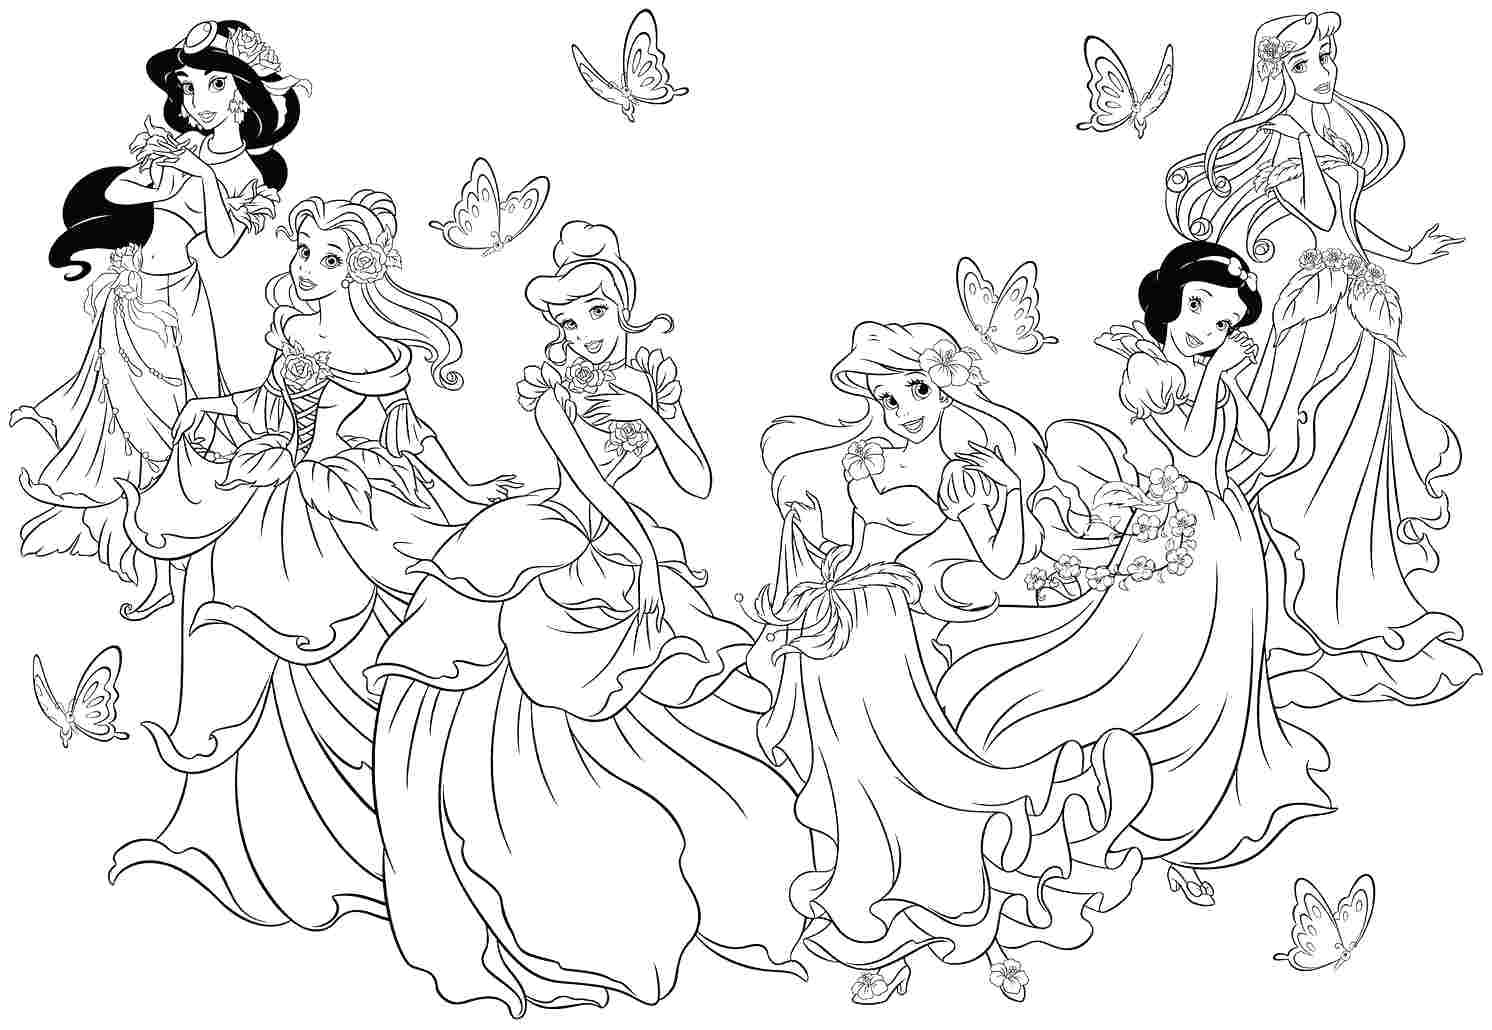 Printable Princess Coloring Pages - Hwnsurf - Free Printable Princess Coloring Pages